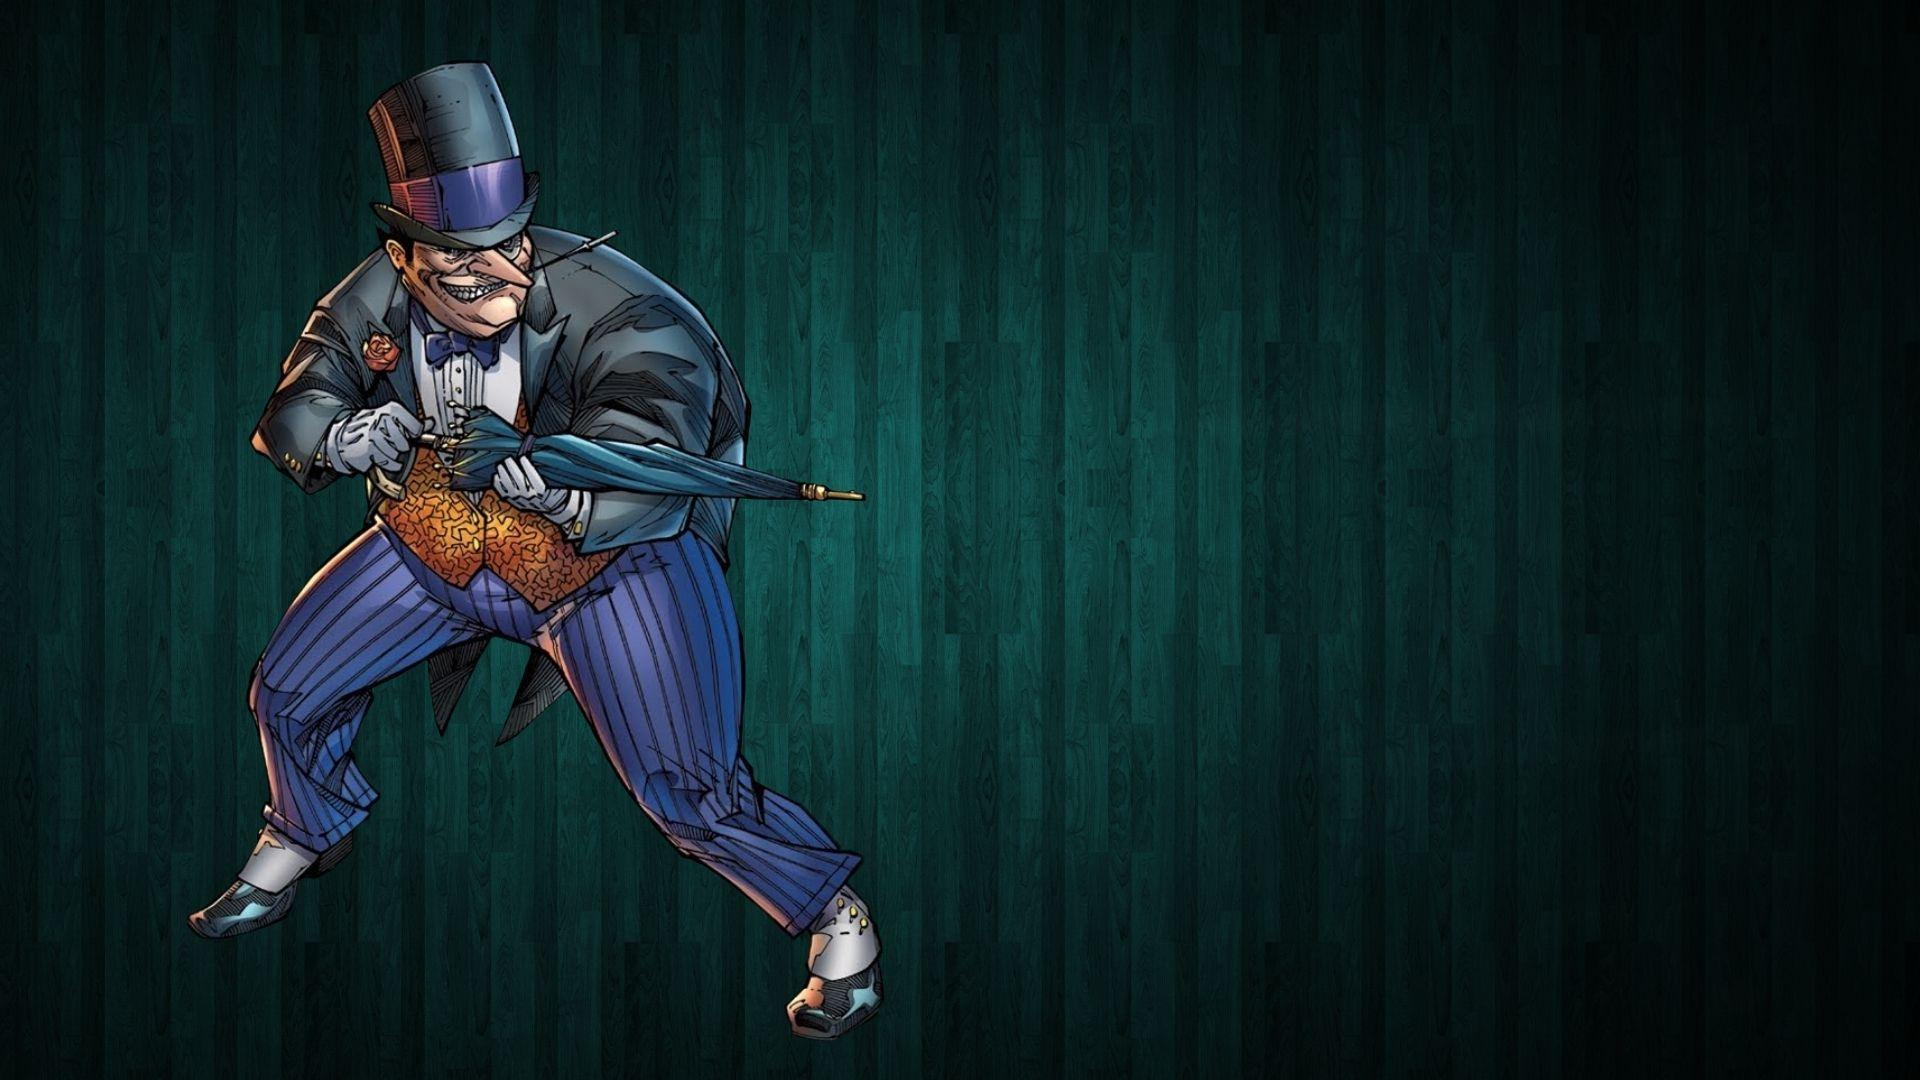 The Joker Animated Wallpaper Hd The Penguin With His Umbrella Batman Wallpaper